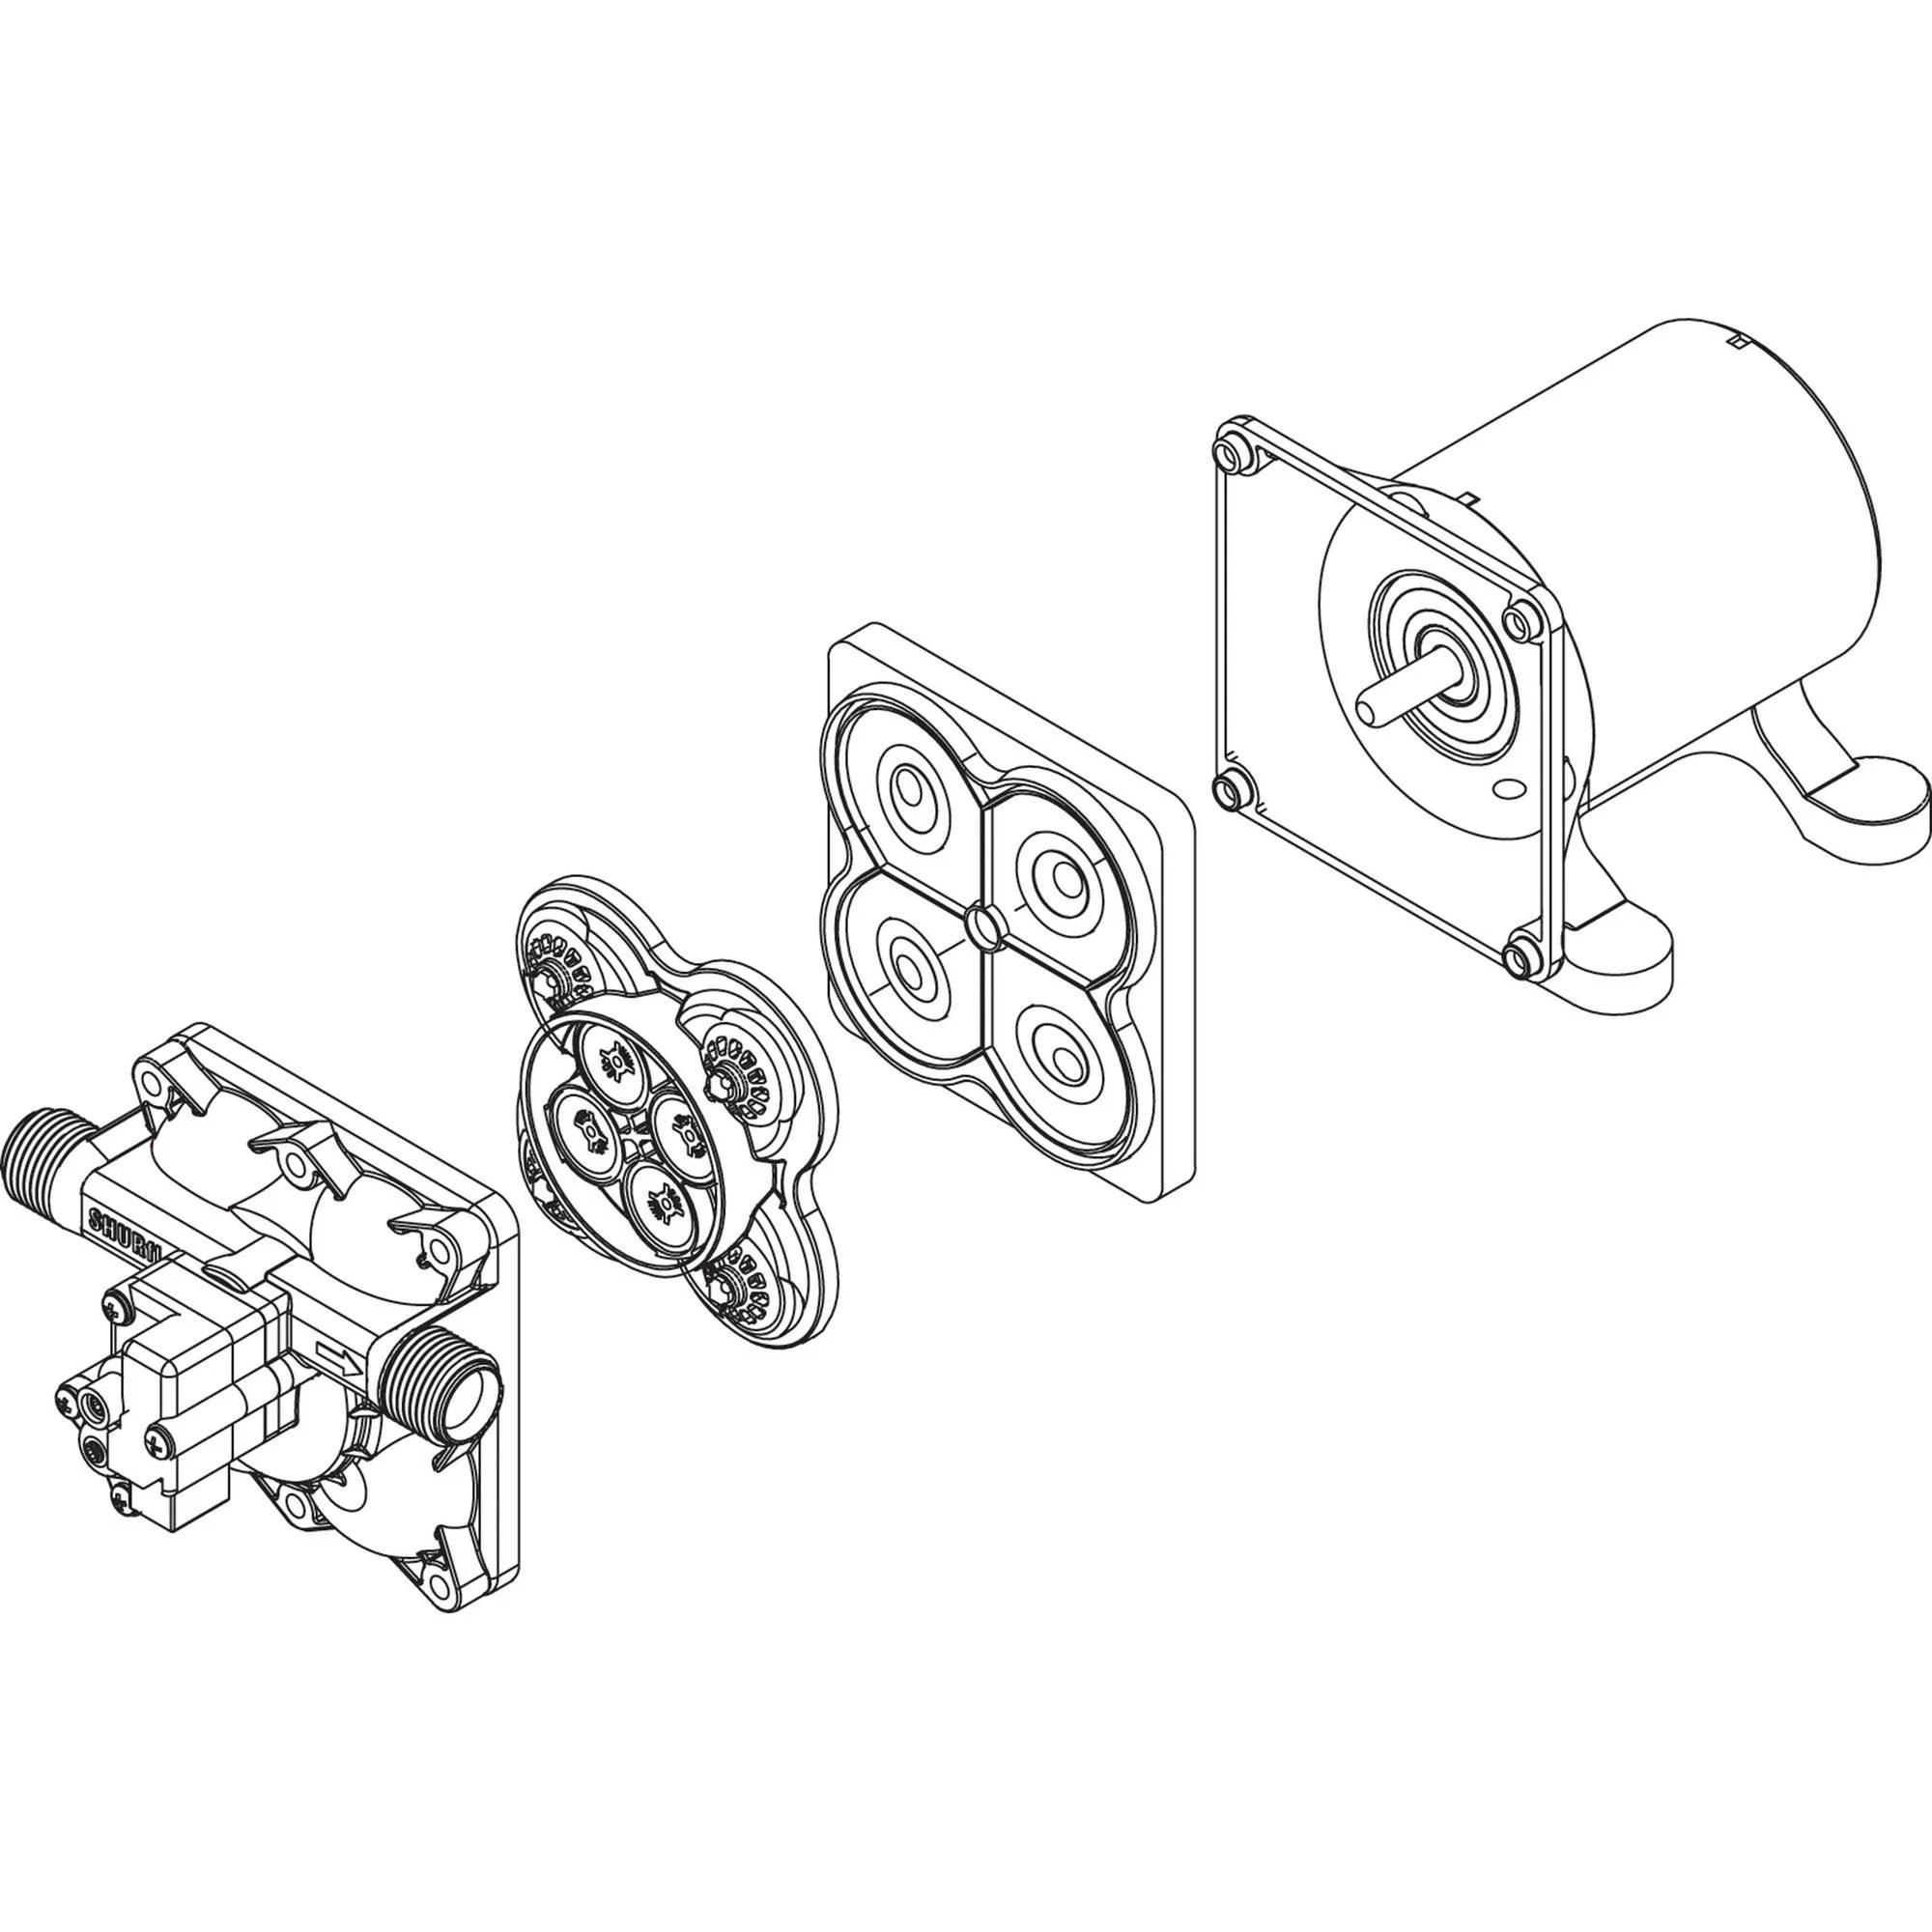 hight resolution of dresser 8 check valve diagram